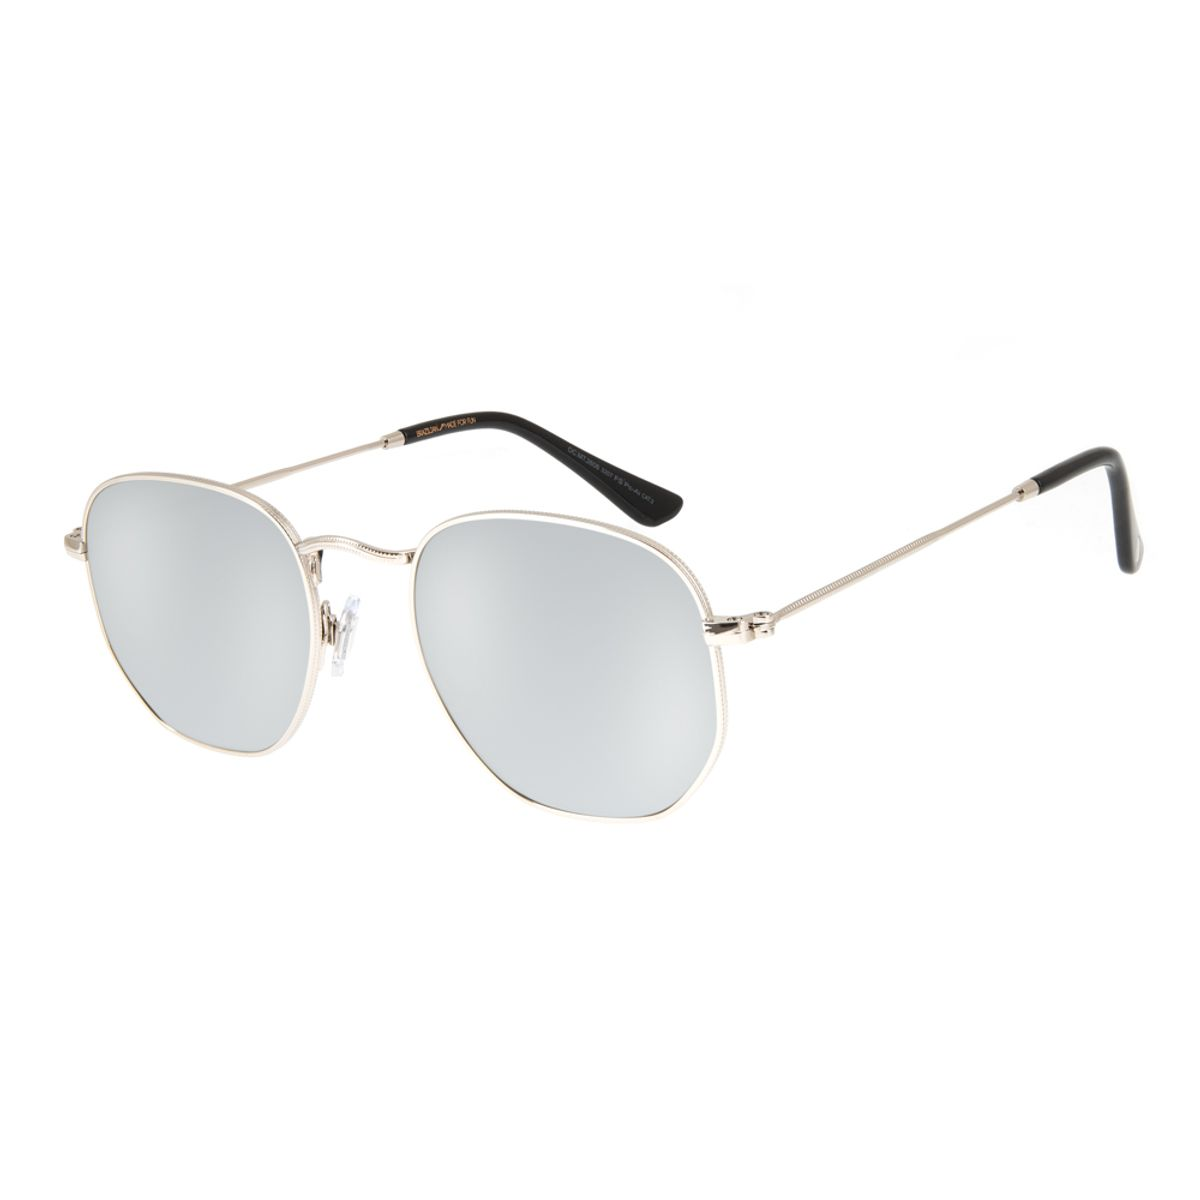 807d85666 Óculos de Sol Chilli Beans Unissex Metal Redondo Prata 2606 - Chilli ...